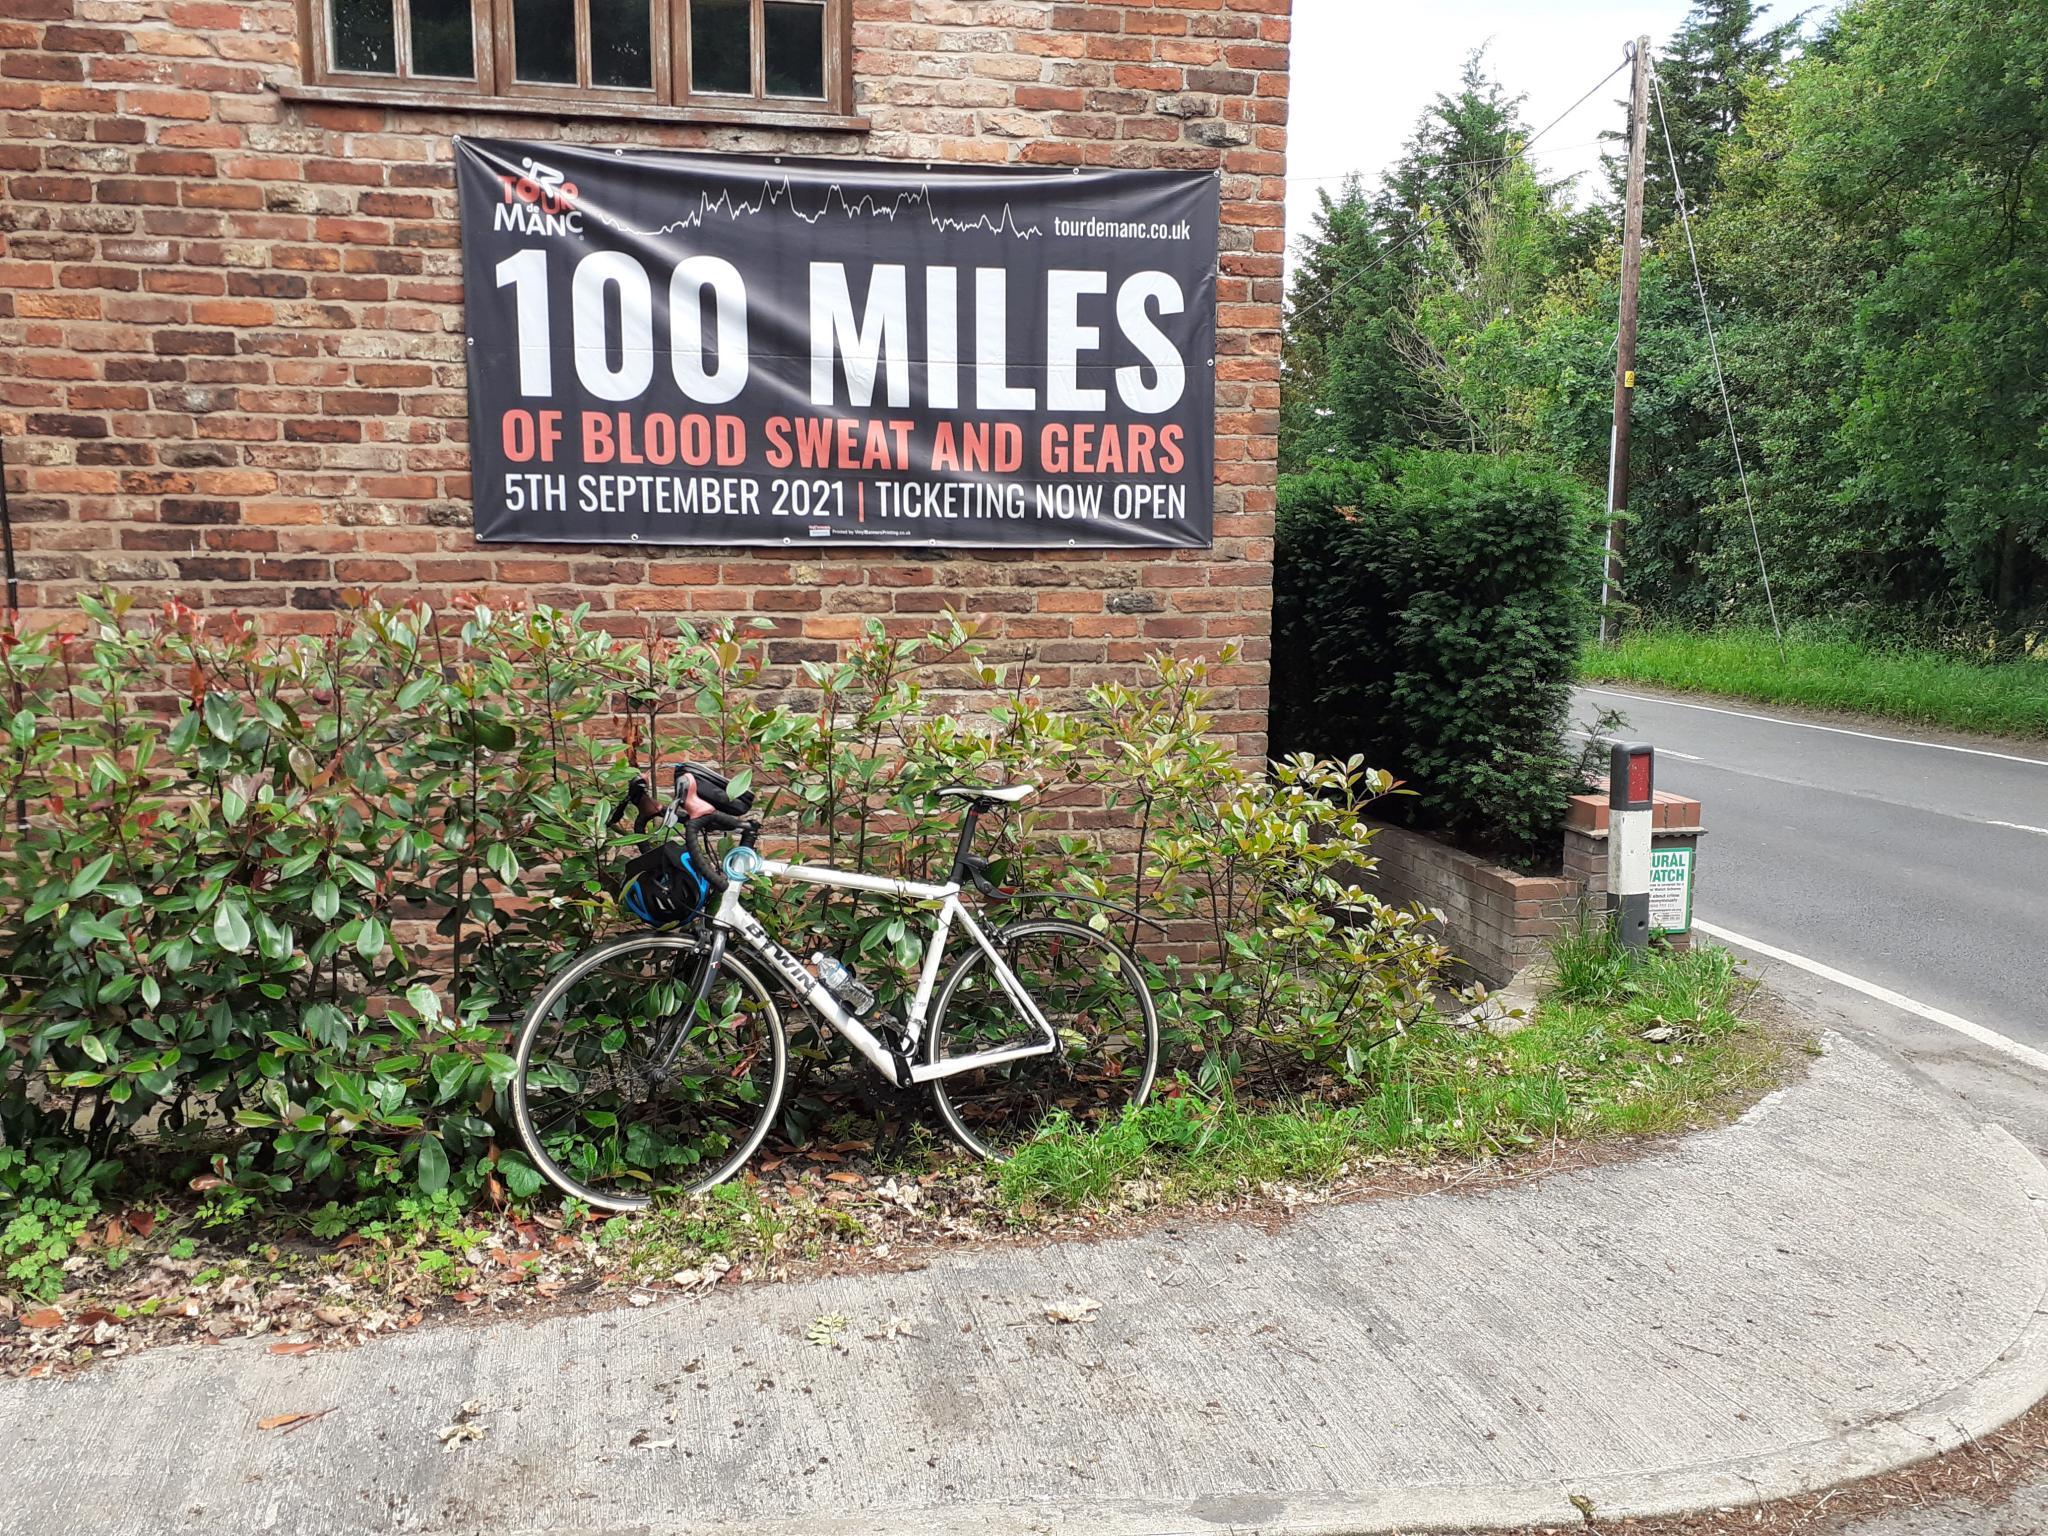 On my bike-20210629_142154-jpg